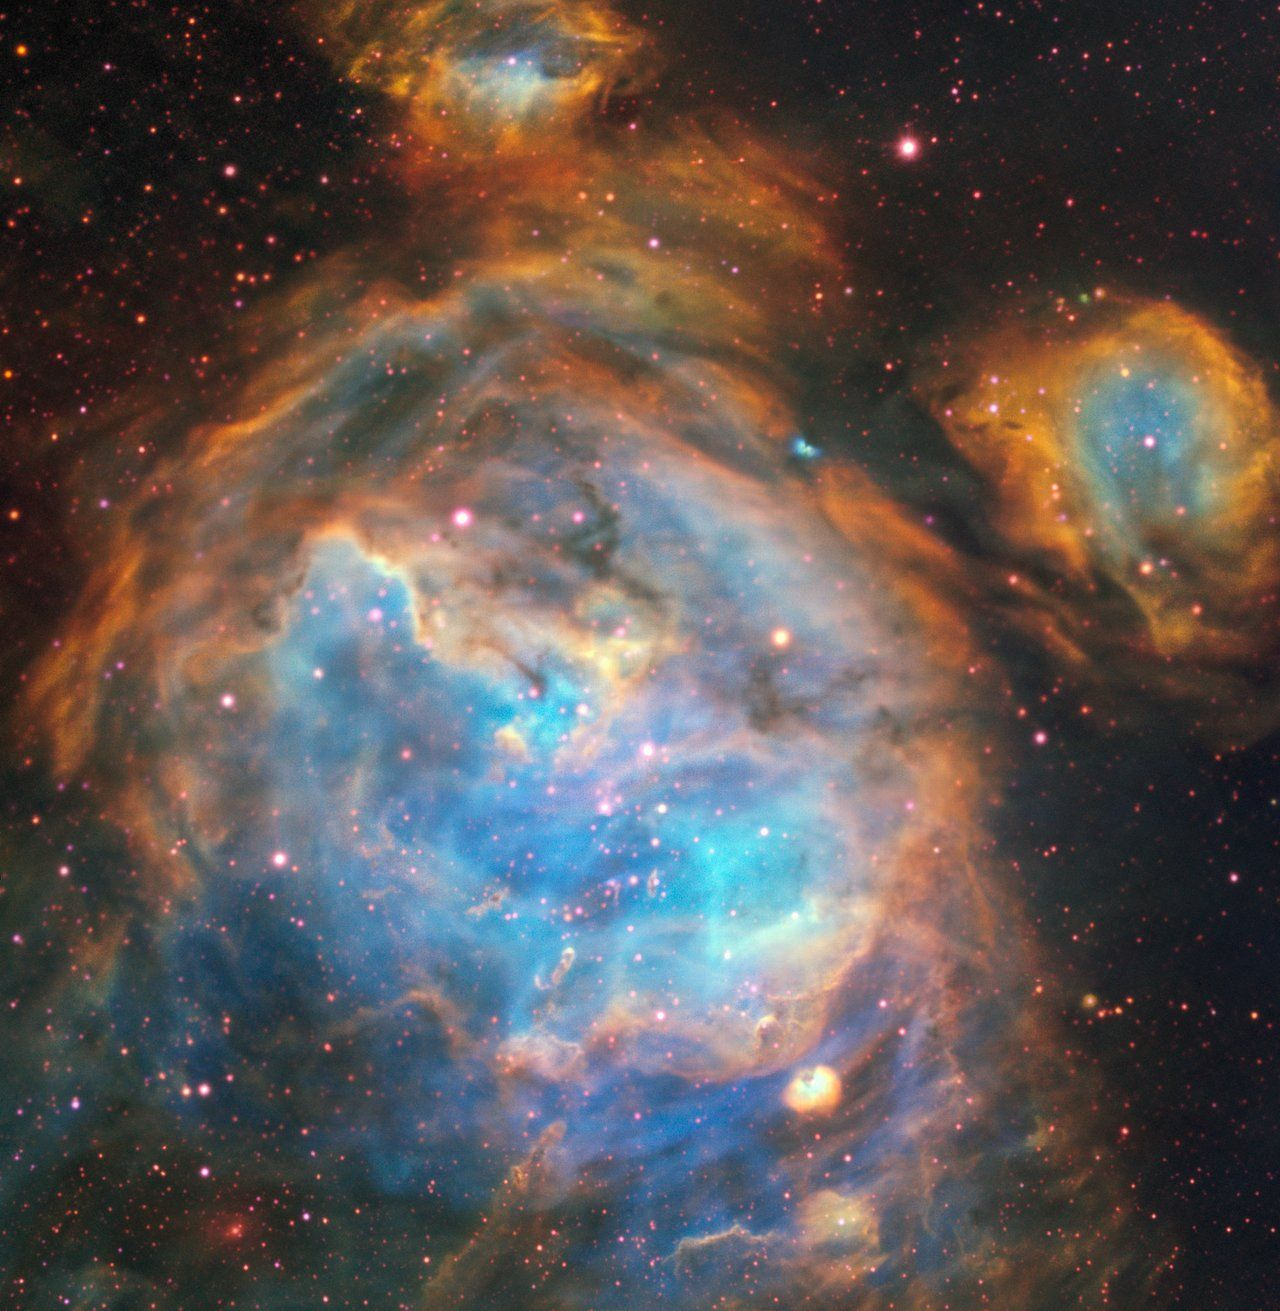 Stellar nursery in Large Magellanic Cloud